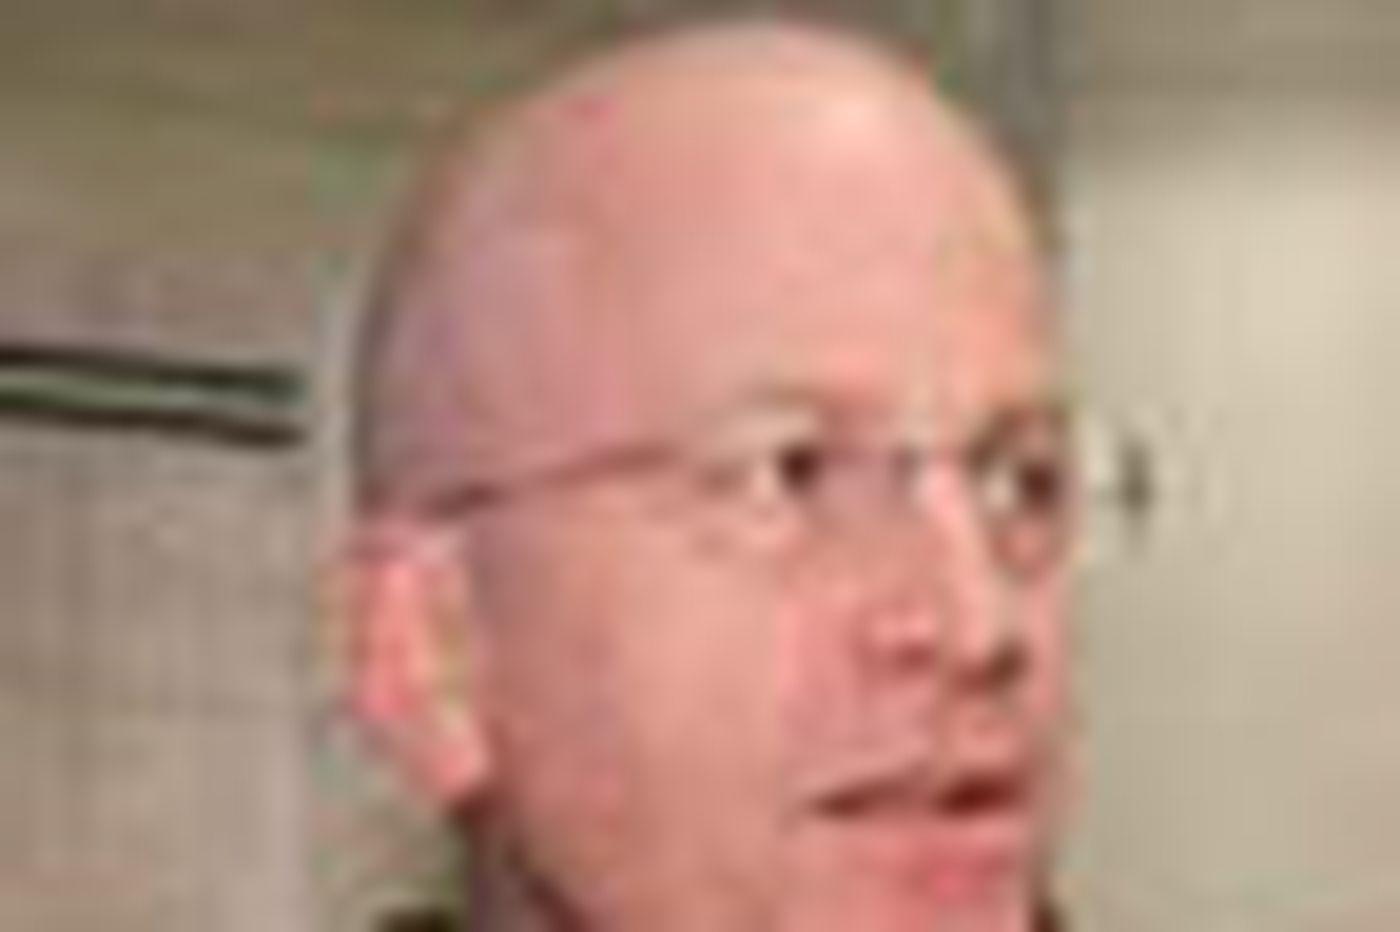 Montco's Hoeffel will not seek another term